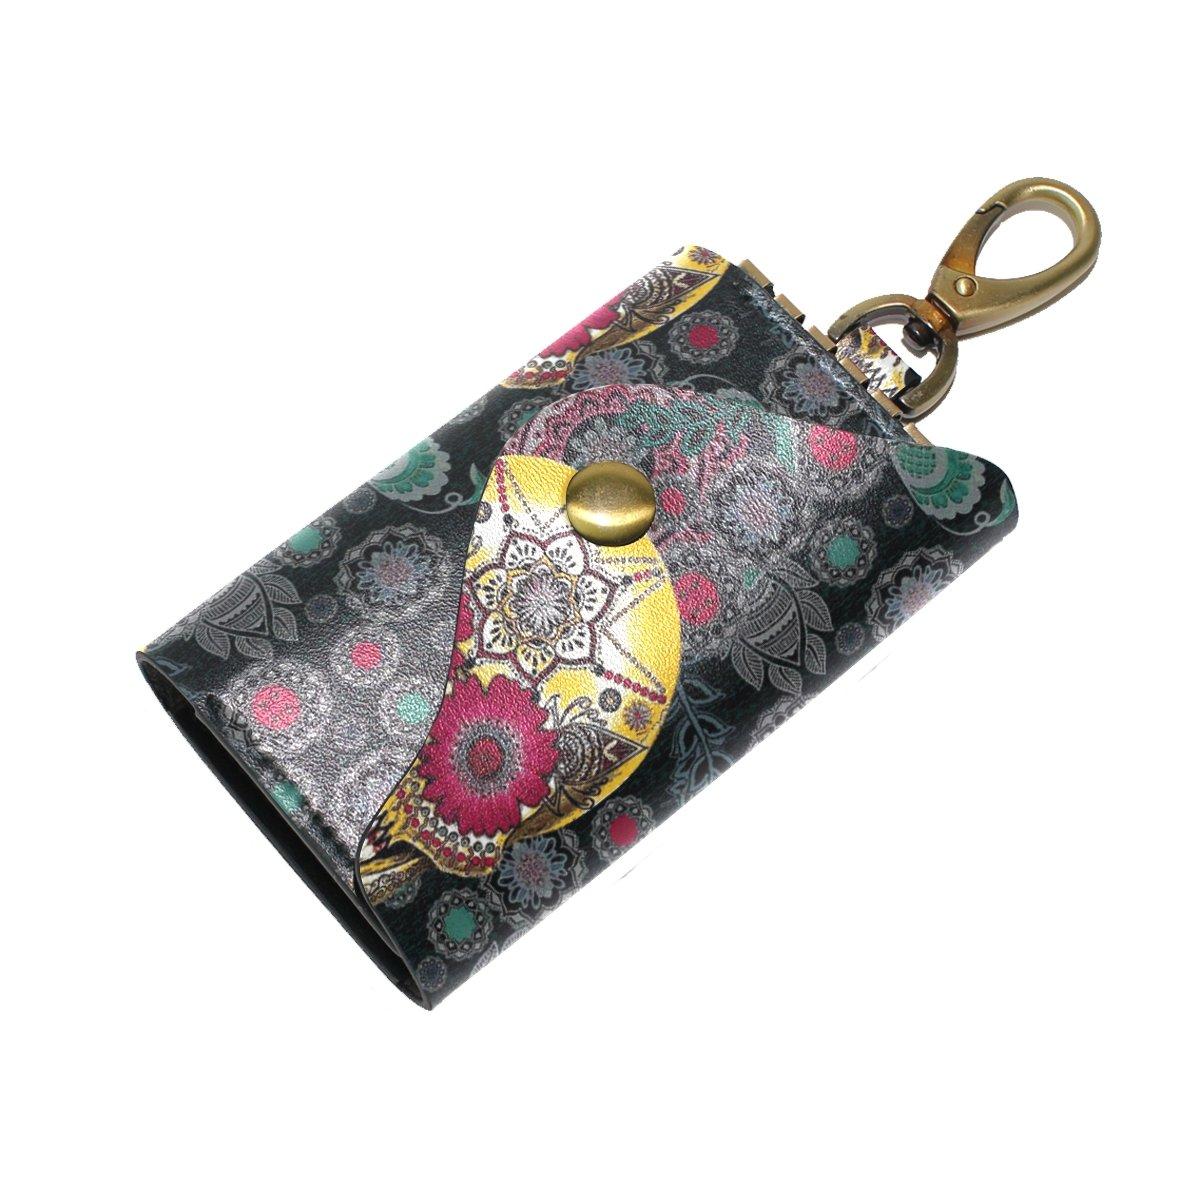 DEYYA Sugar Skull Leather Key Case Wallets Unisex Keychain Key Holder with 6 Hooks Snap Closure